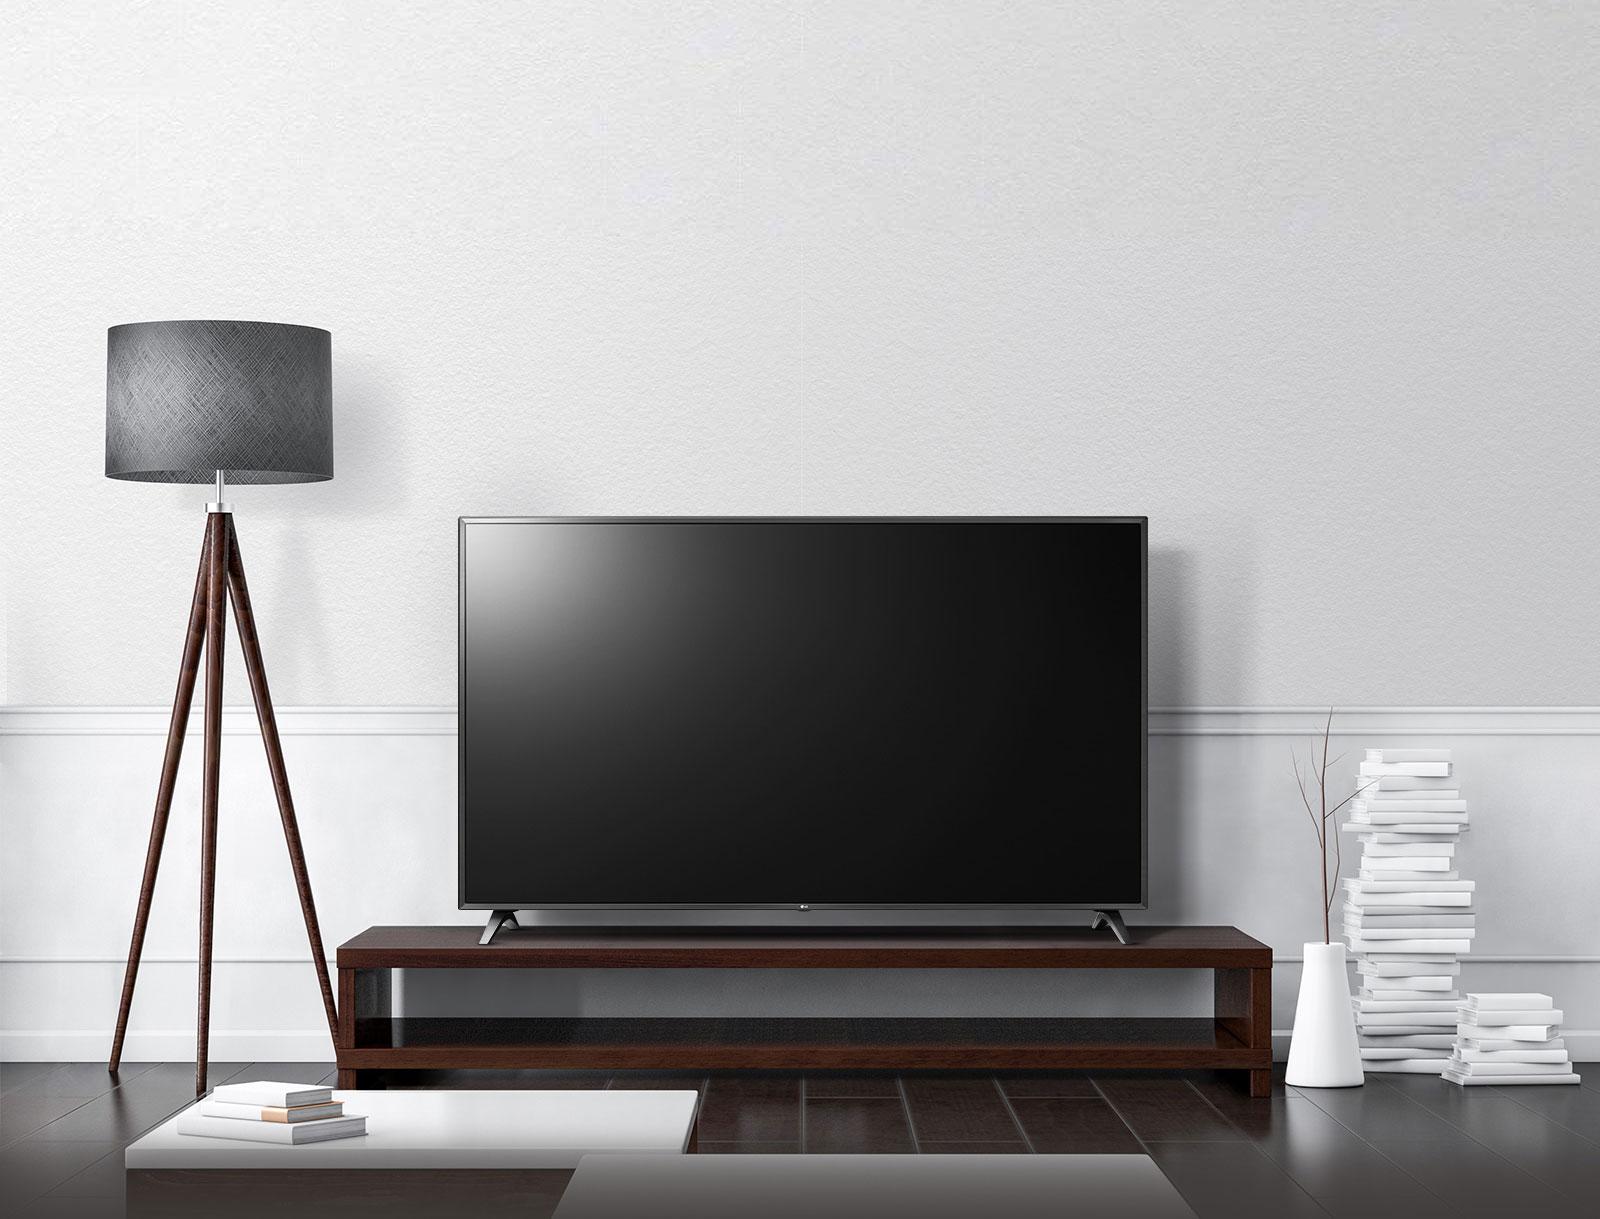 TV-UHD-70-UM71-09-Design-Desktop